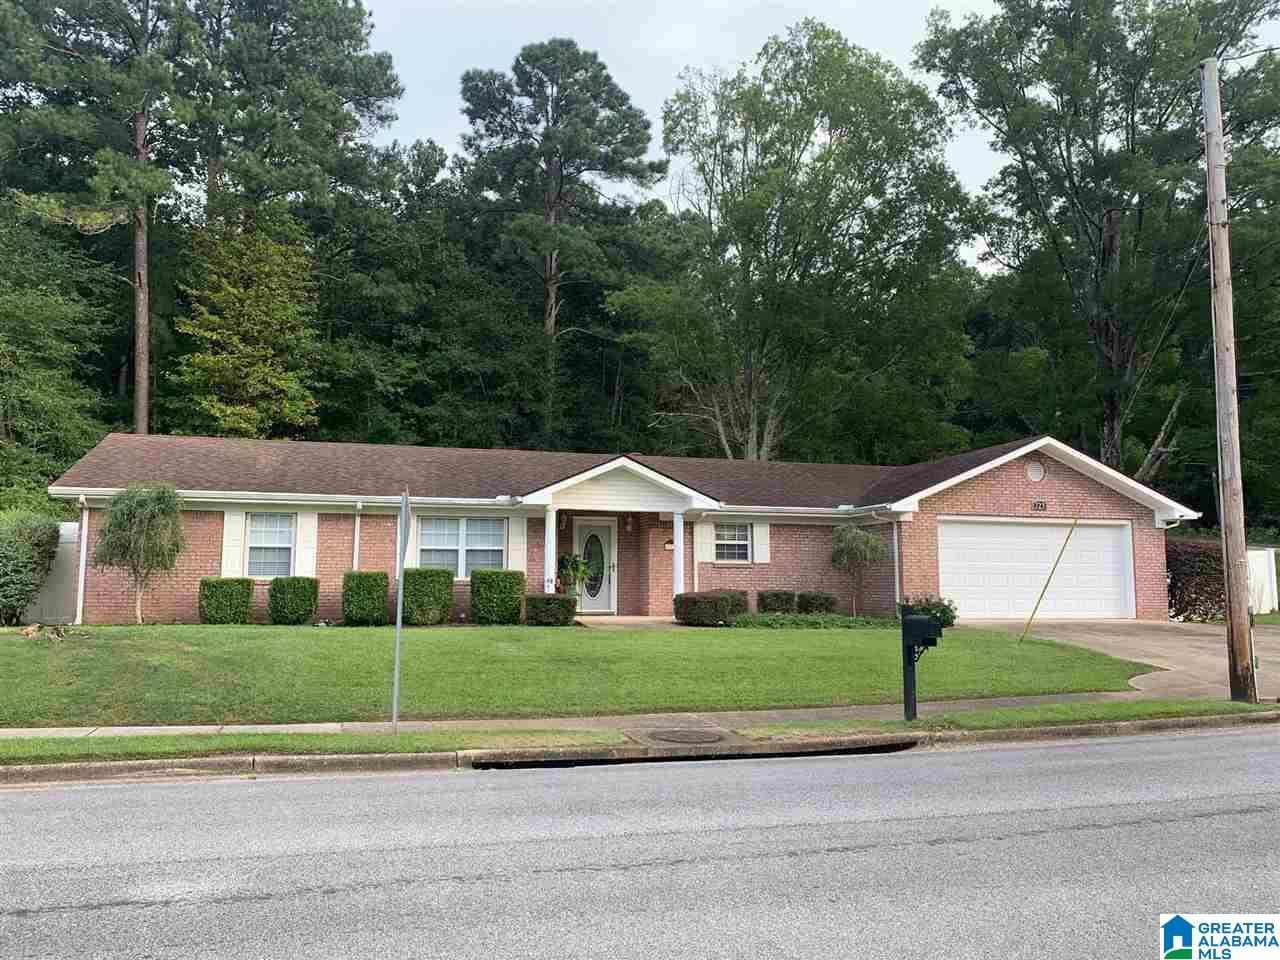 723 LITTLEBRANDT DRIVE, Anniston, AL 36205 - MLS#: 1298293